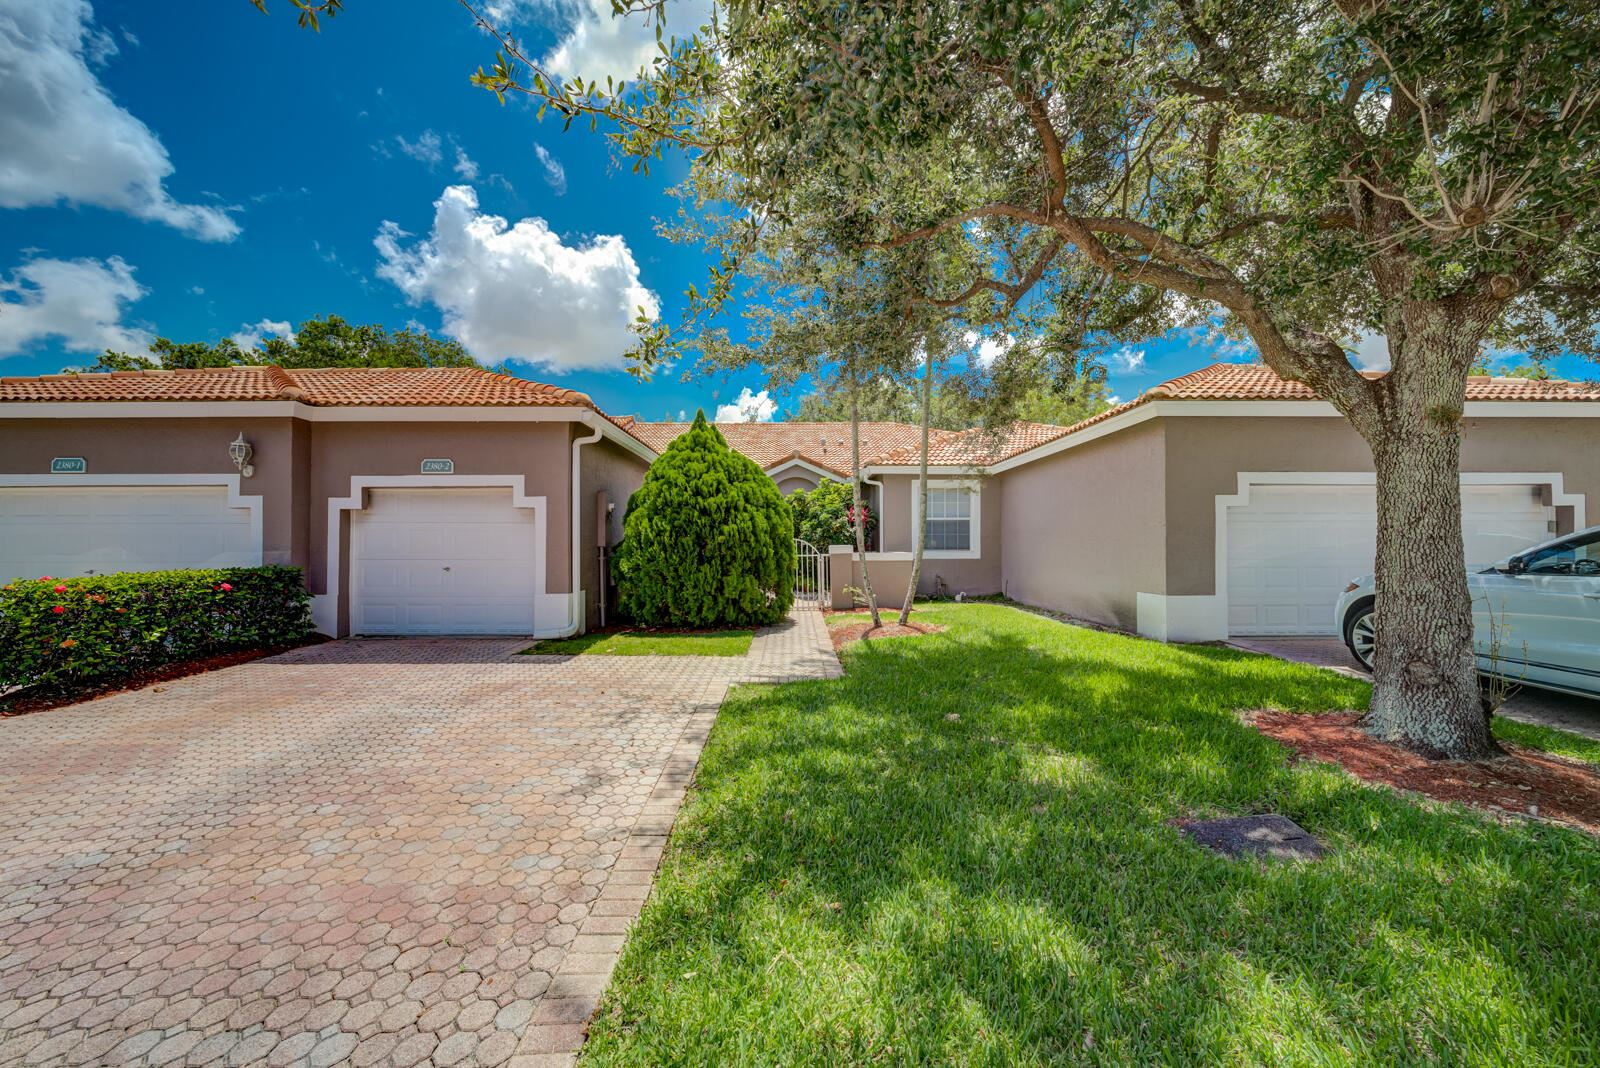 2380 E Aragon Boulevard #2, Sunrise, FL 33313 - MLS#: RX-10680109